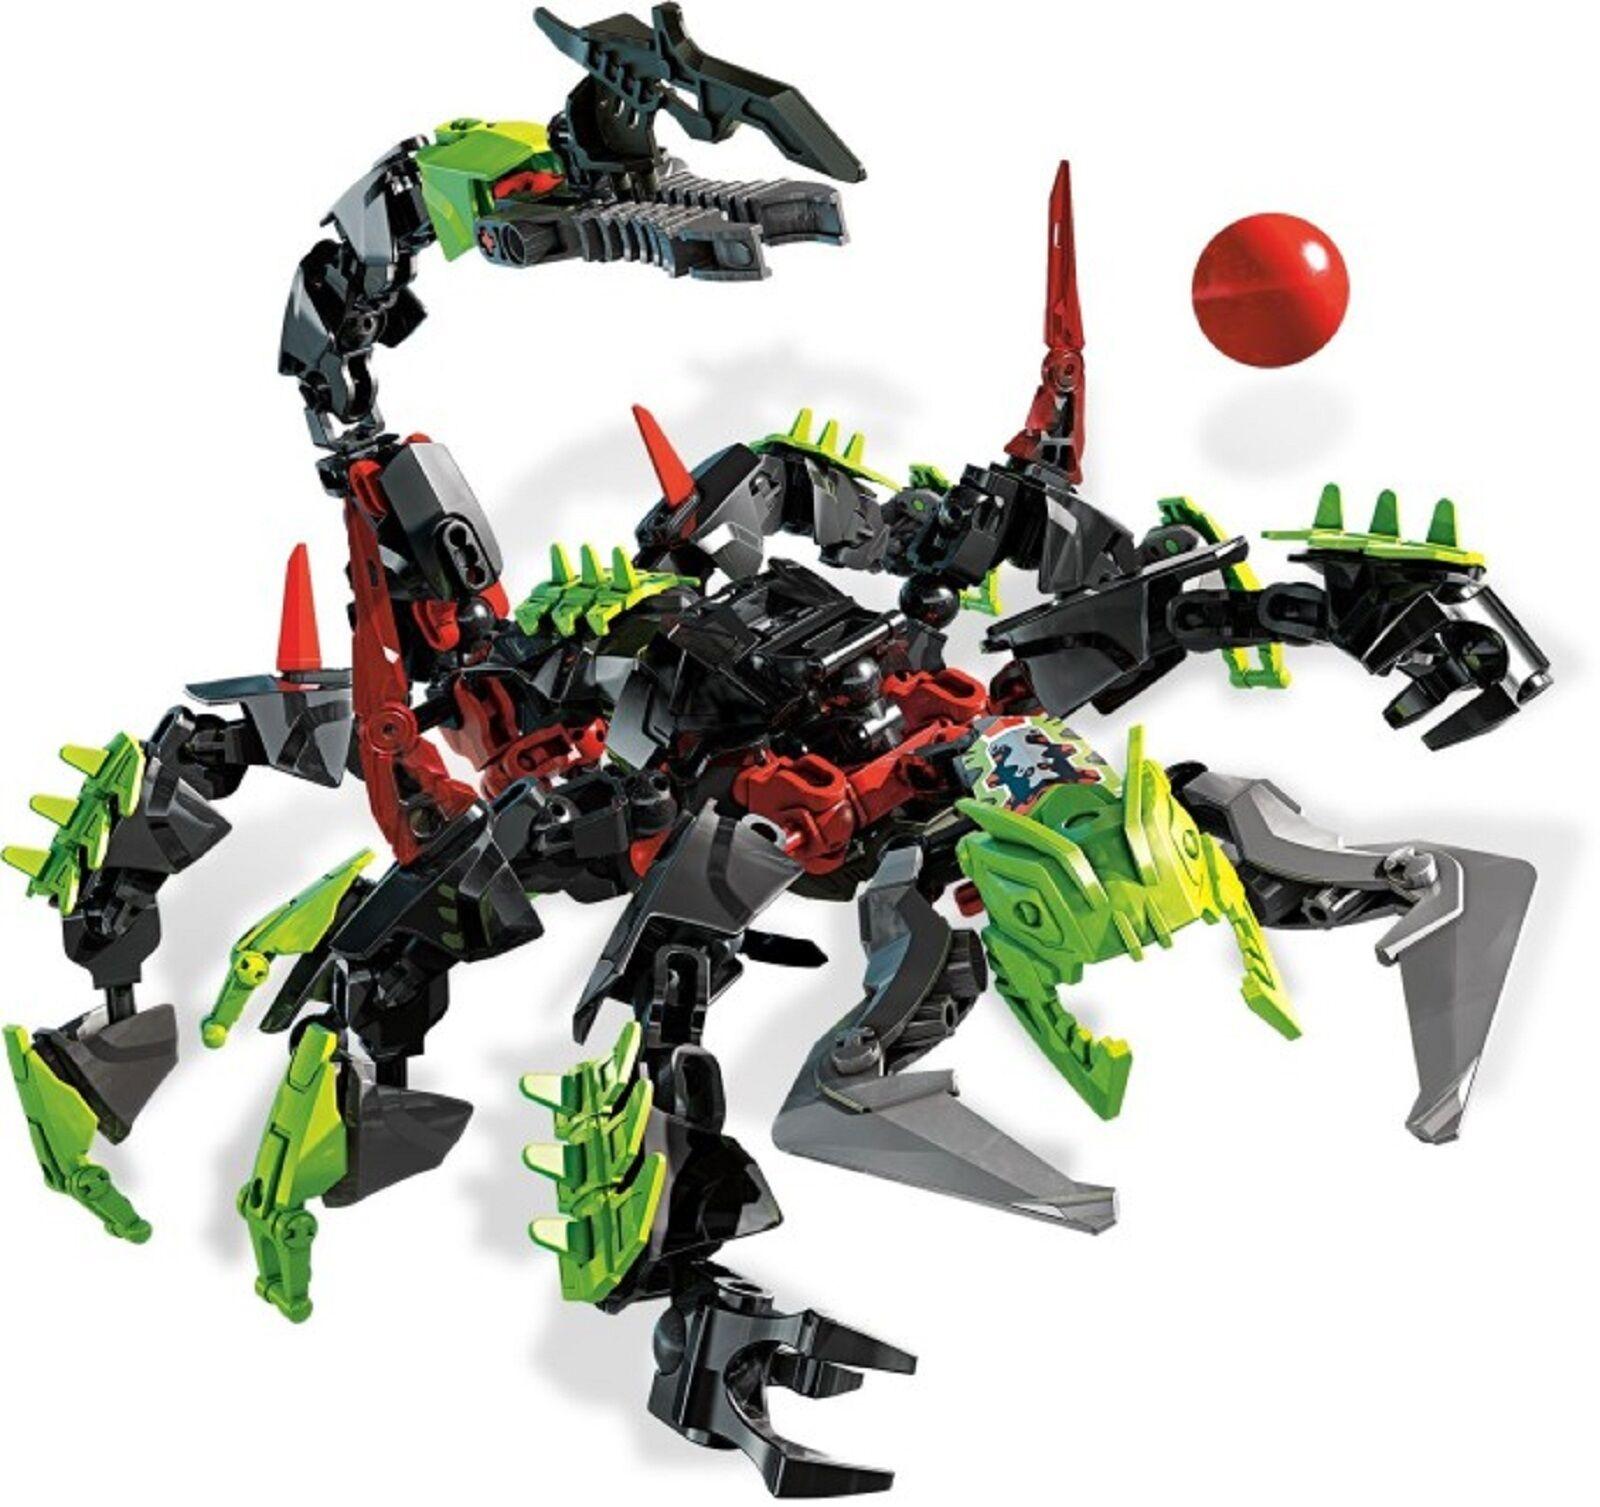 Lego 2236 Hero Hero Hero Factory Villians Scorpio complet à 100 % de 2011 + Notice -CN111 12dd24